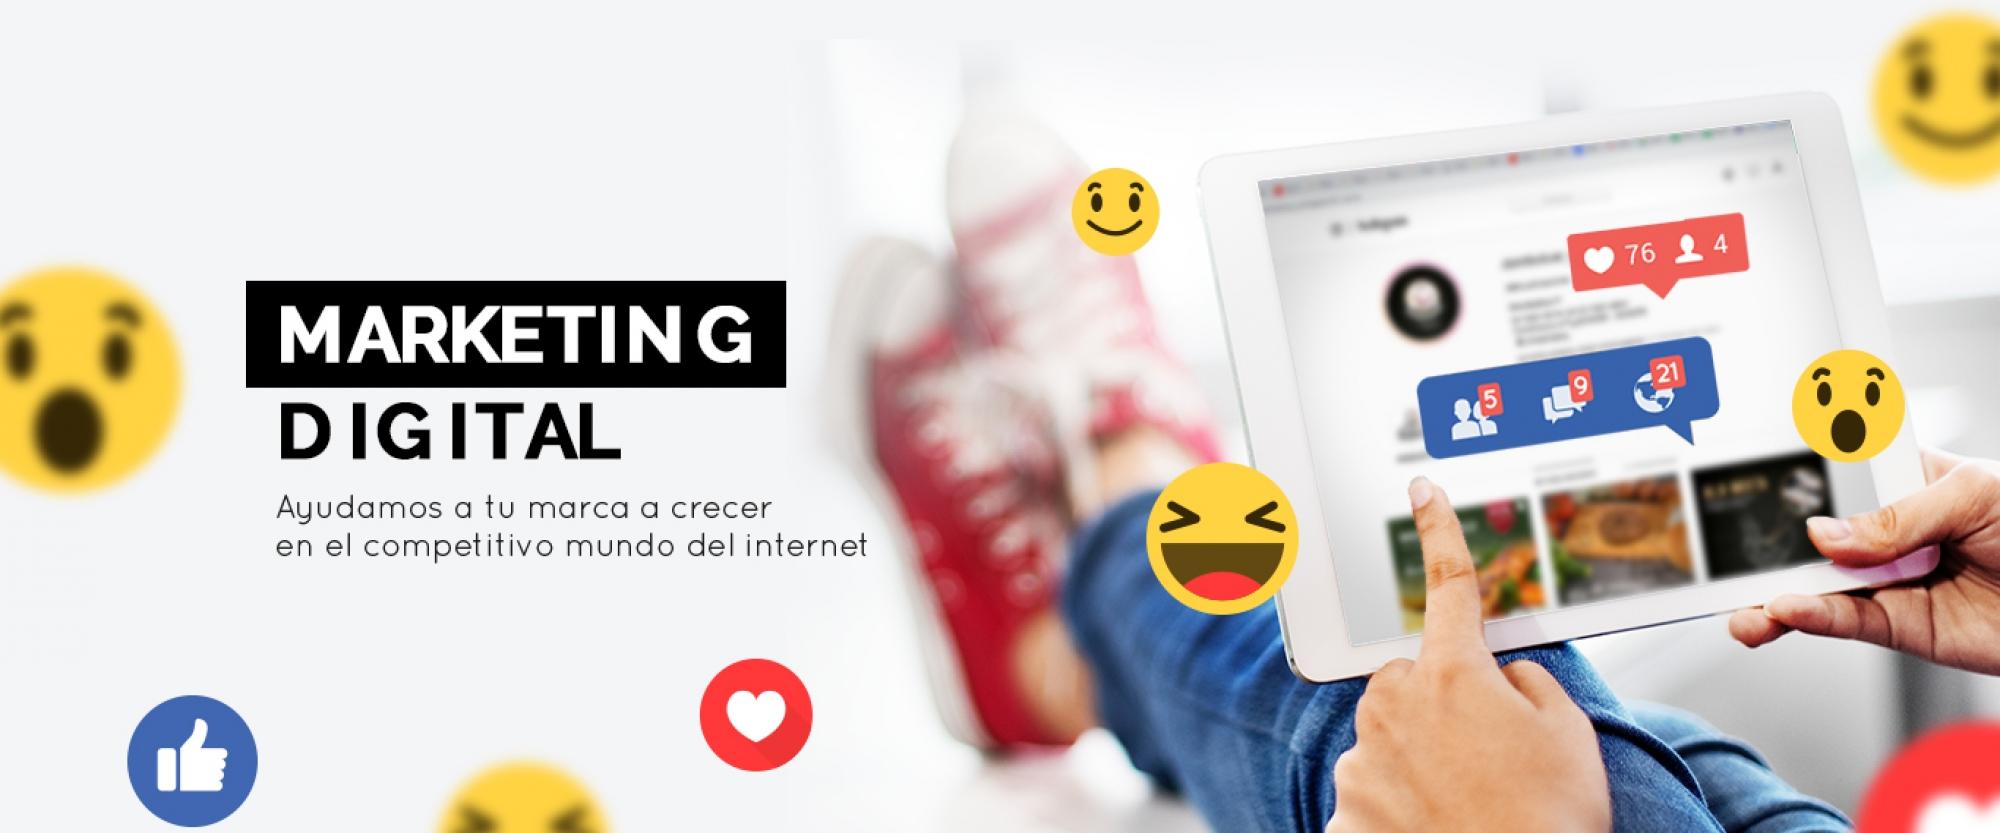 Marketing Digital - Grupo Creativo Macondo